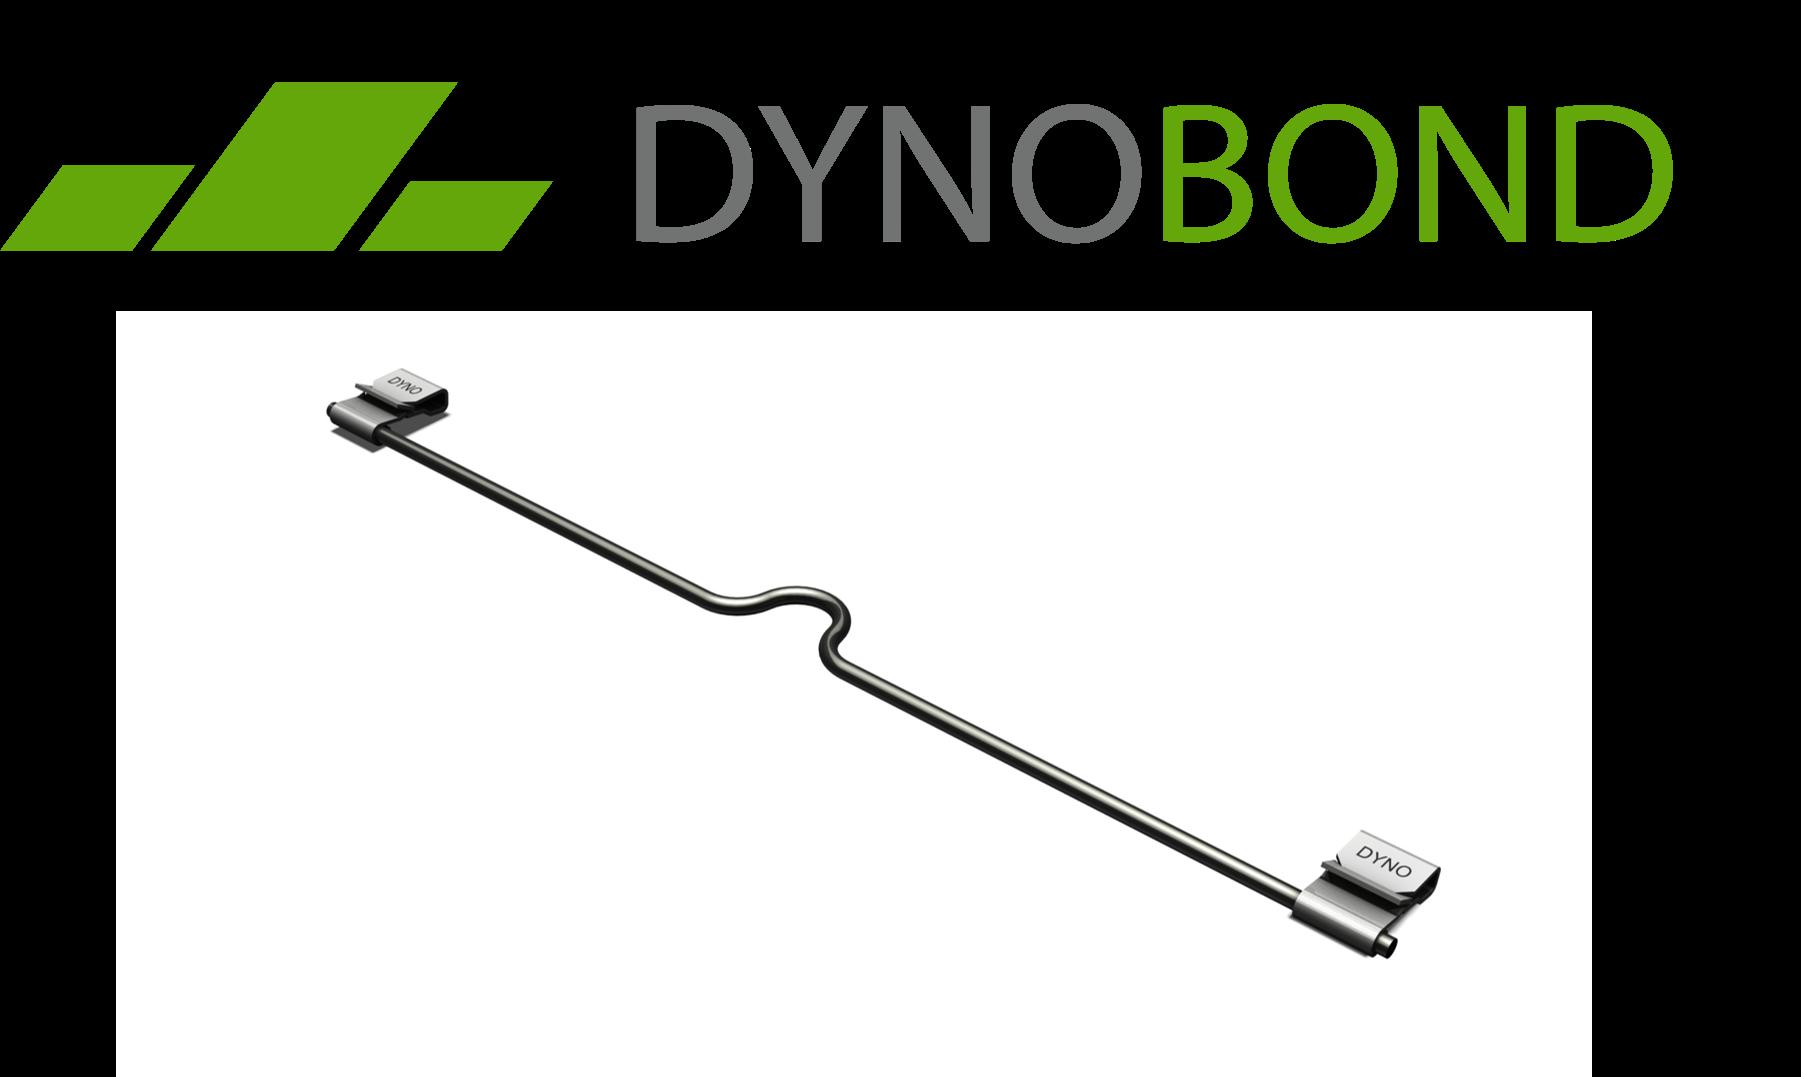 DynoBond